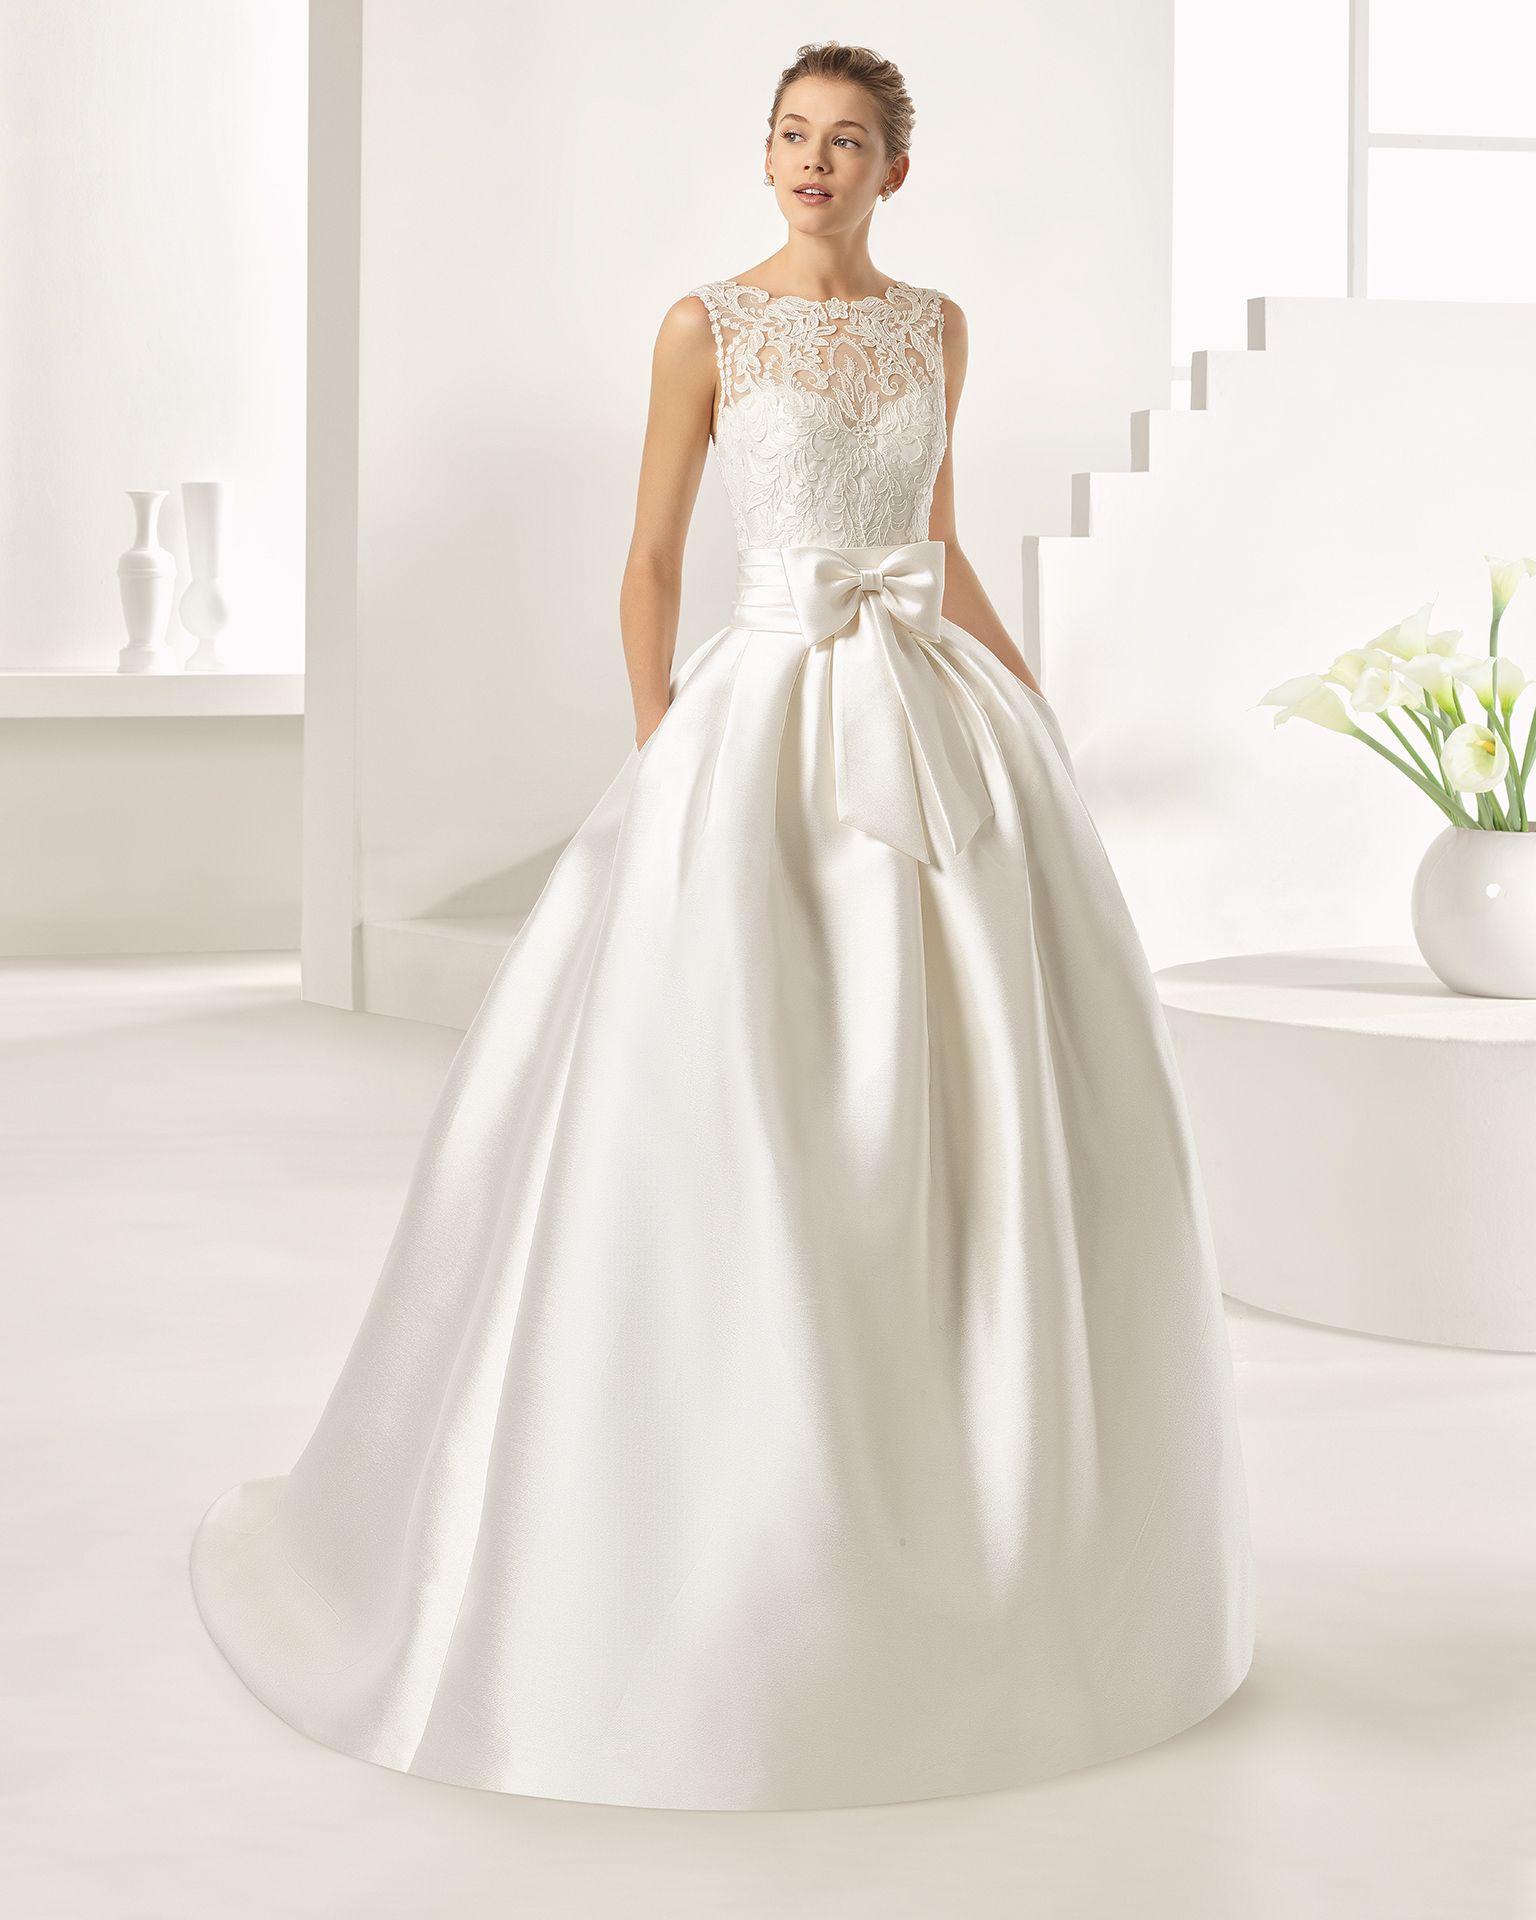 Vestido novia rosa clara encaje